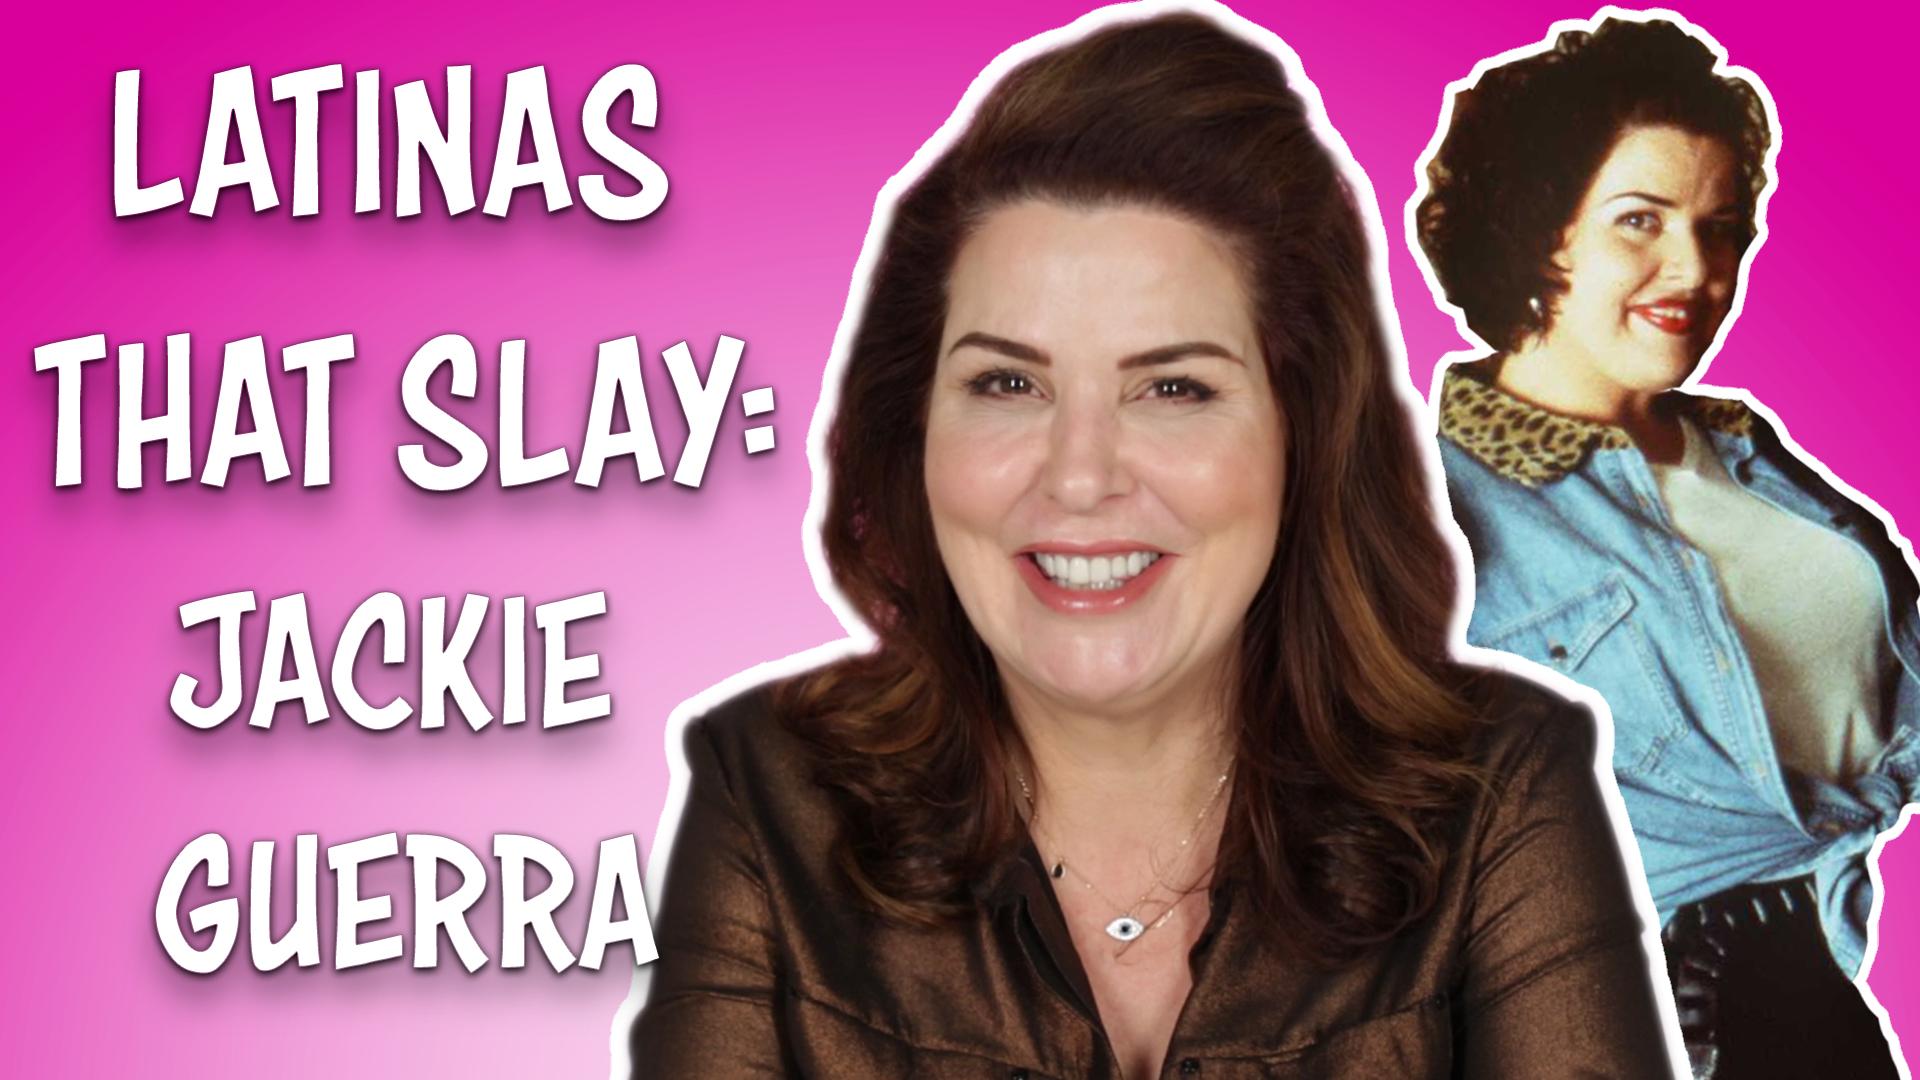 Forum on this topic: Gloria Garayua, jackie-guerra/